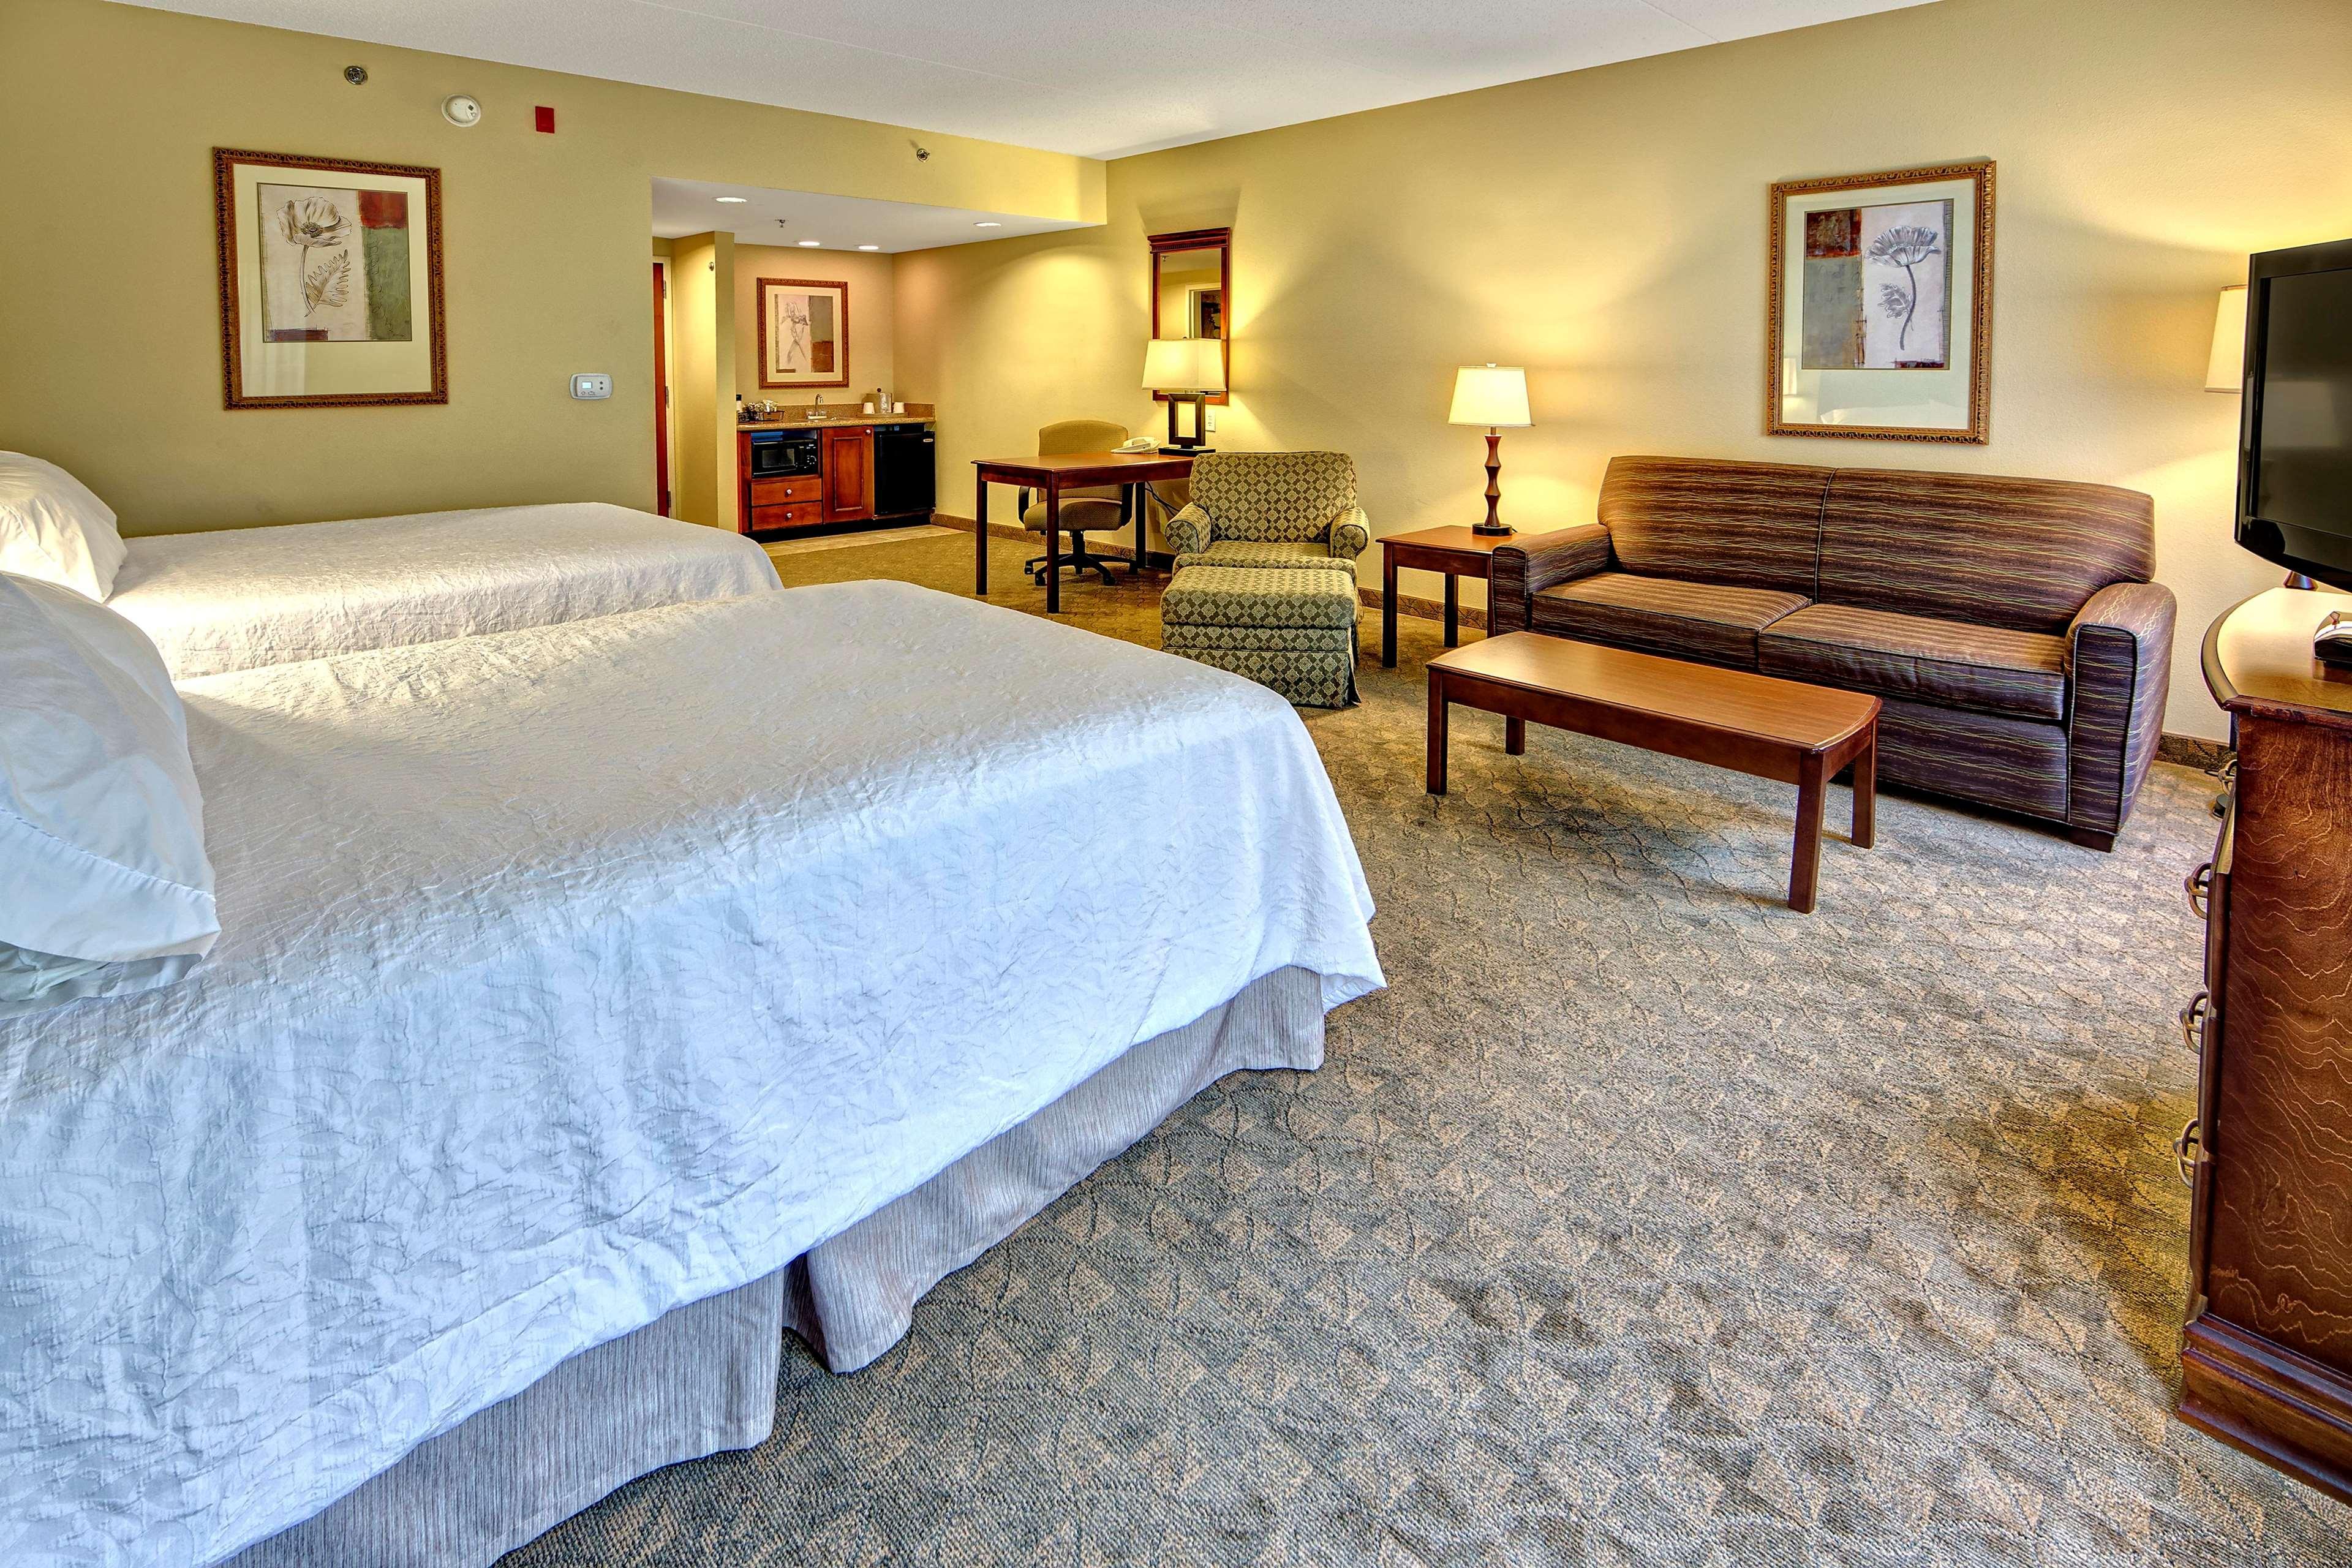 Hampton Inn & Suites Cashiers-Sapphire Valley image 38